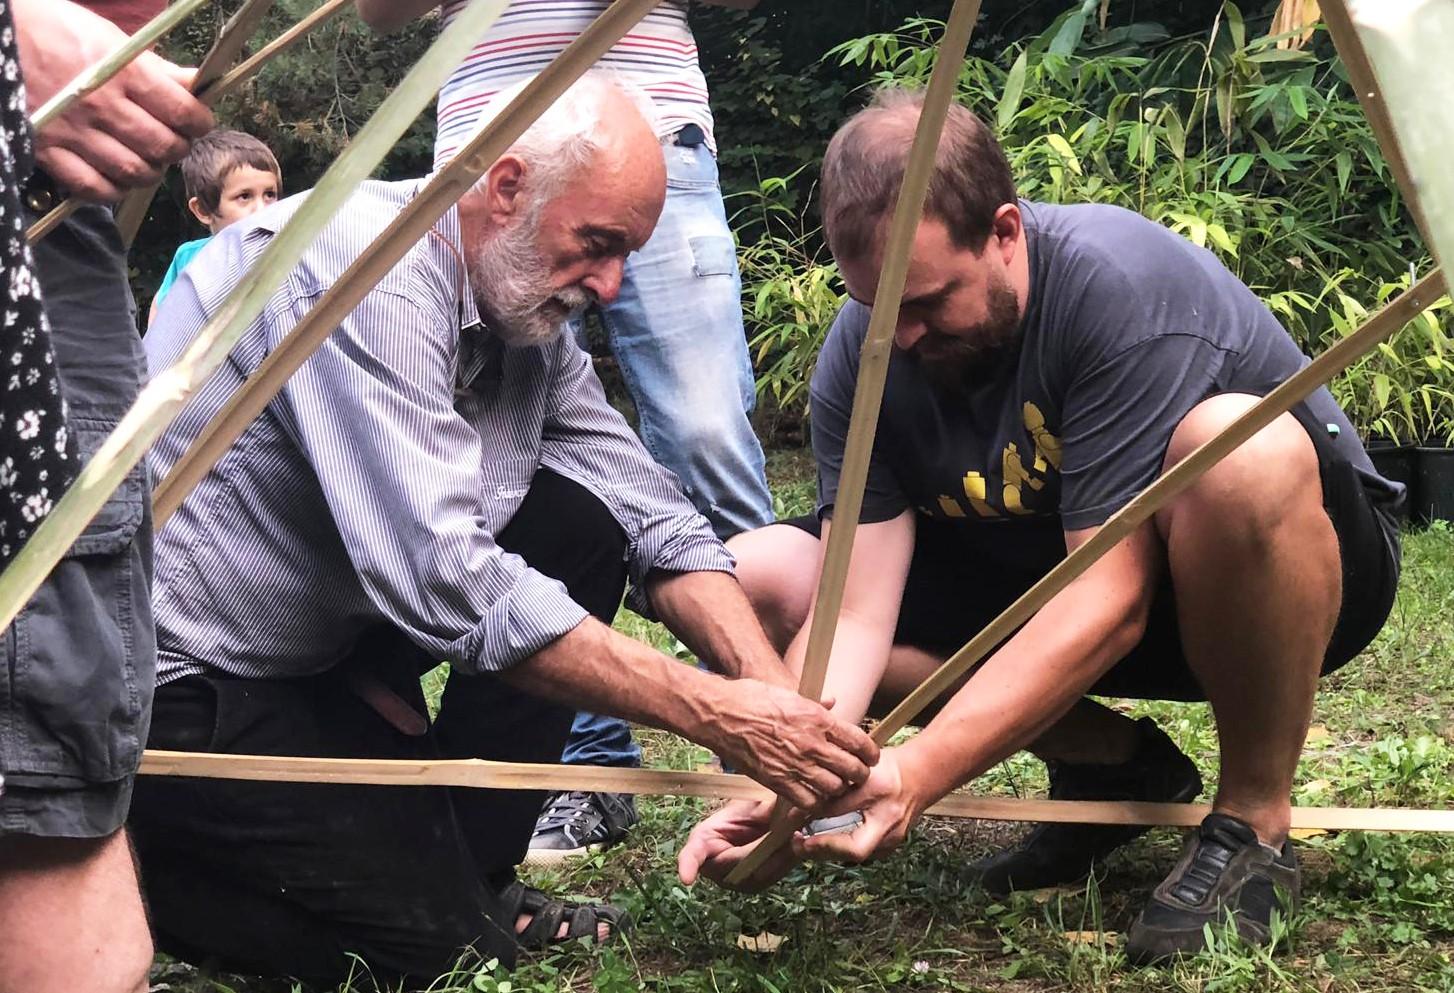 bambu-pianta-futuro-nuova-economia-2